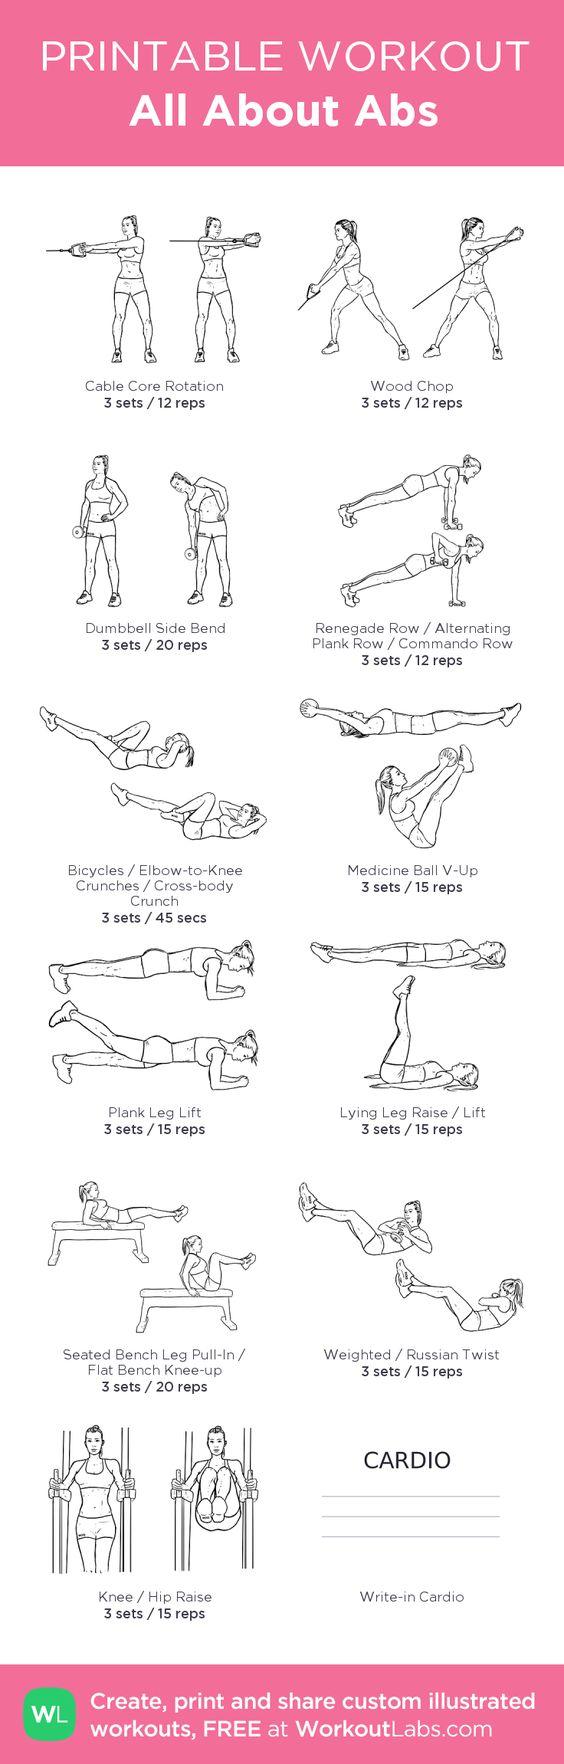 5 Core Workouts from Pinterest - Loren's World